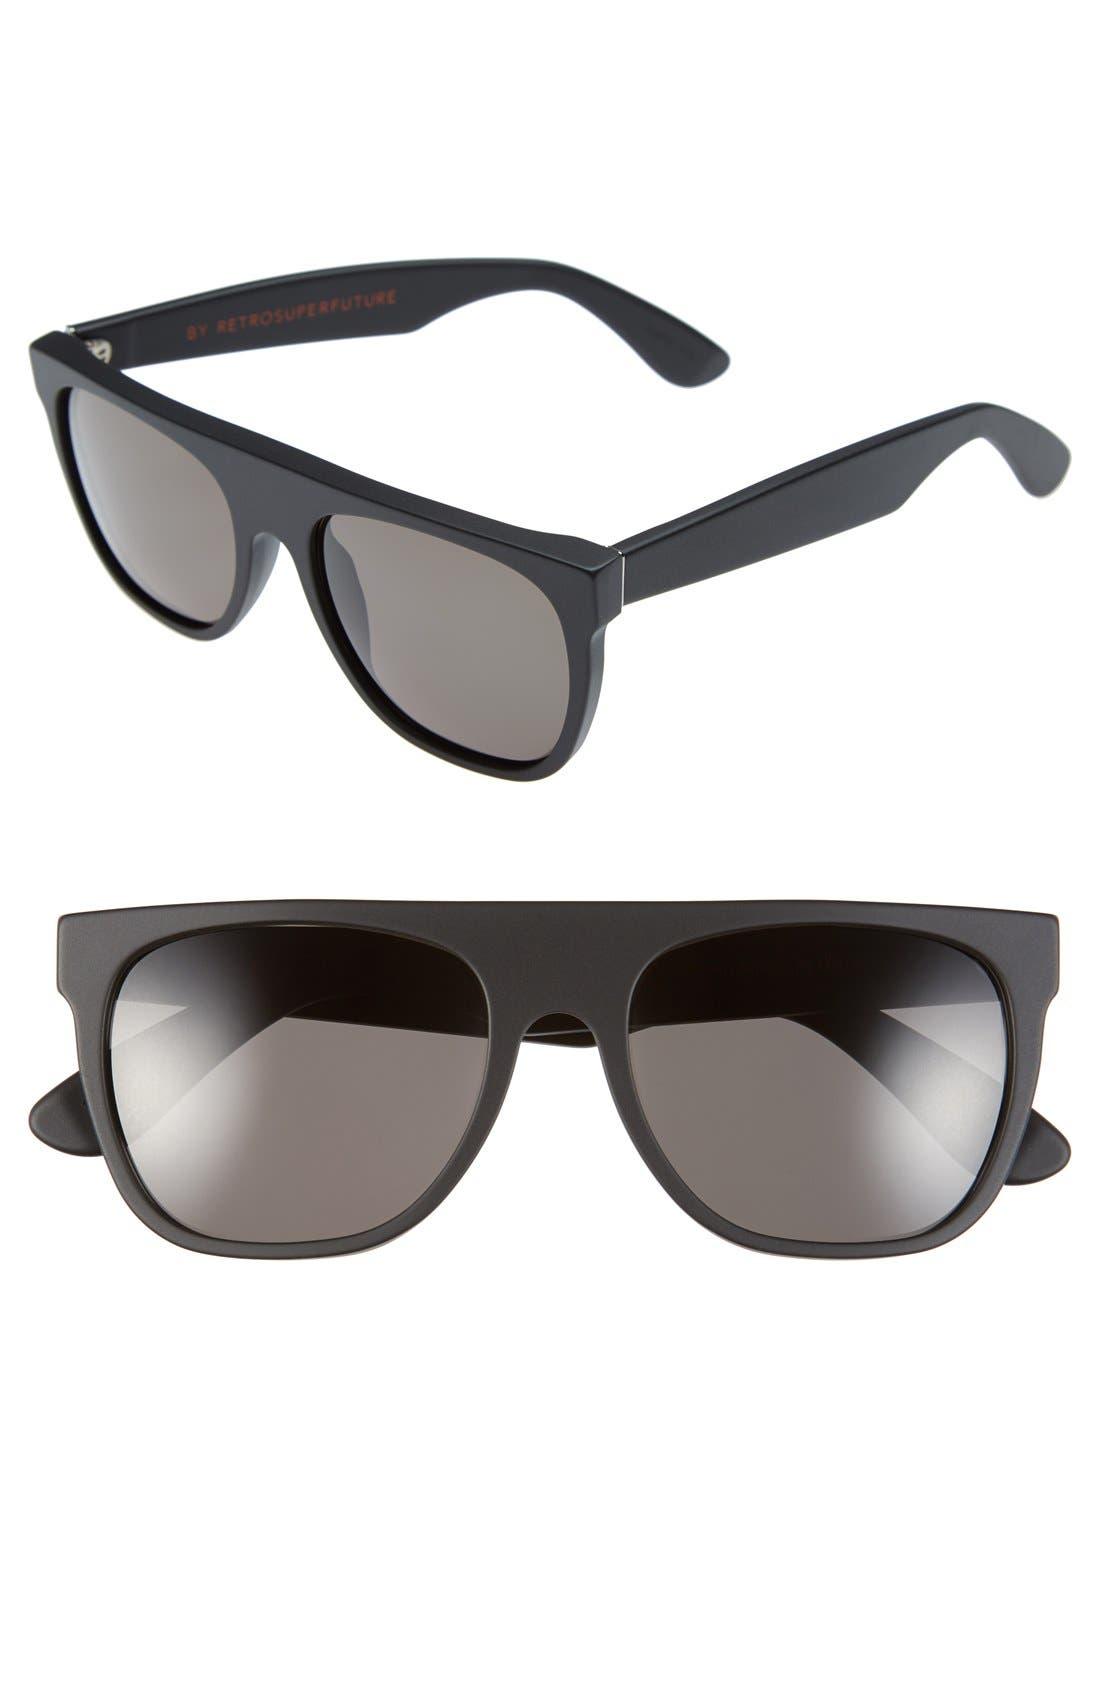 Main Image - SUPER by RETROSUPERFUTURE® 'Flat Top' 55mm Retro Sunglasses